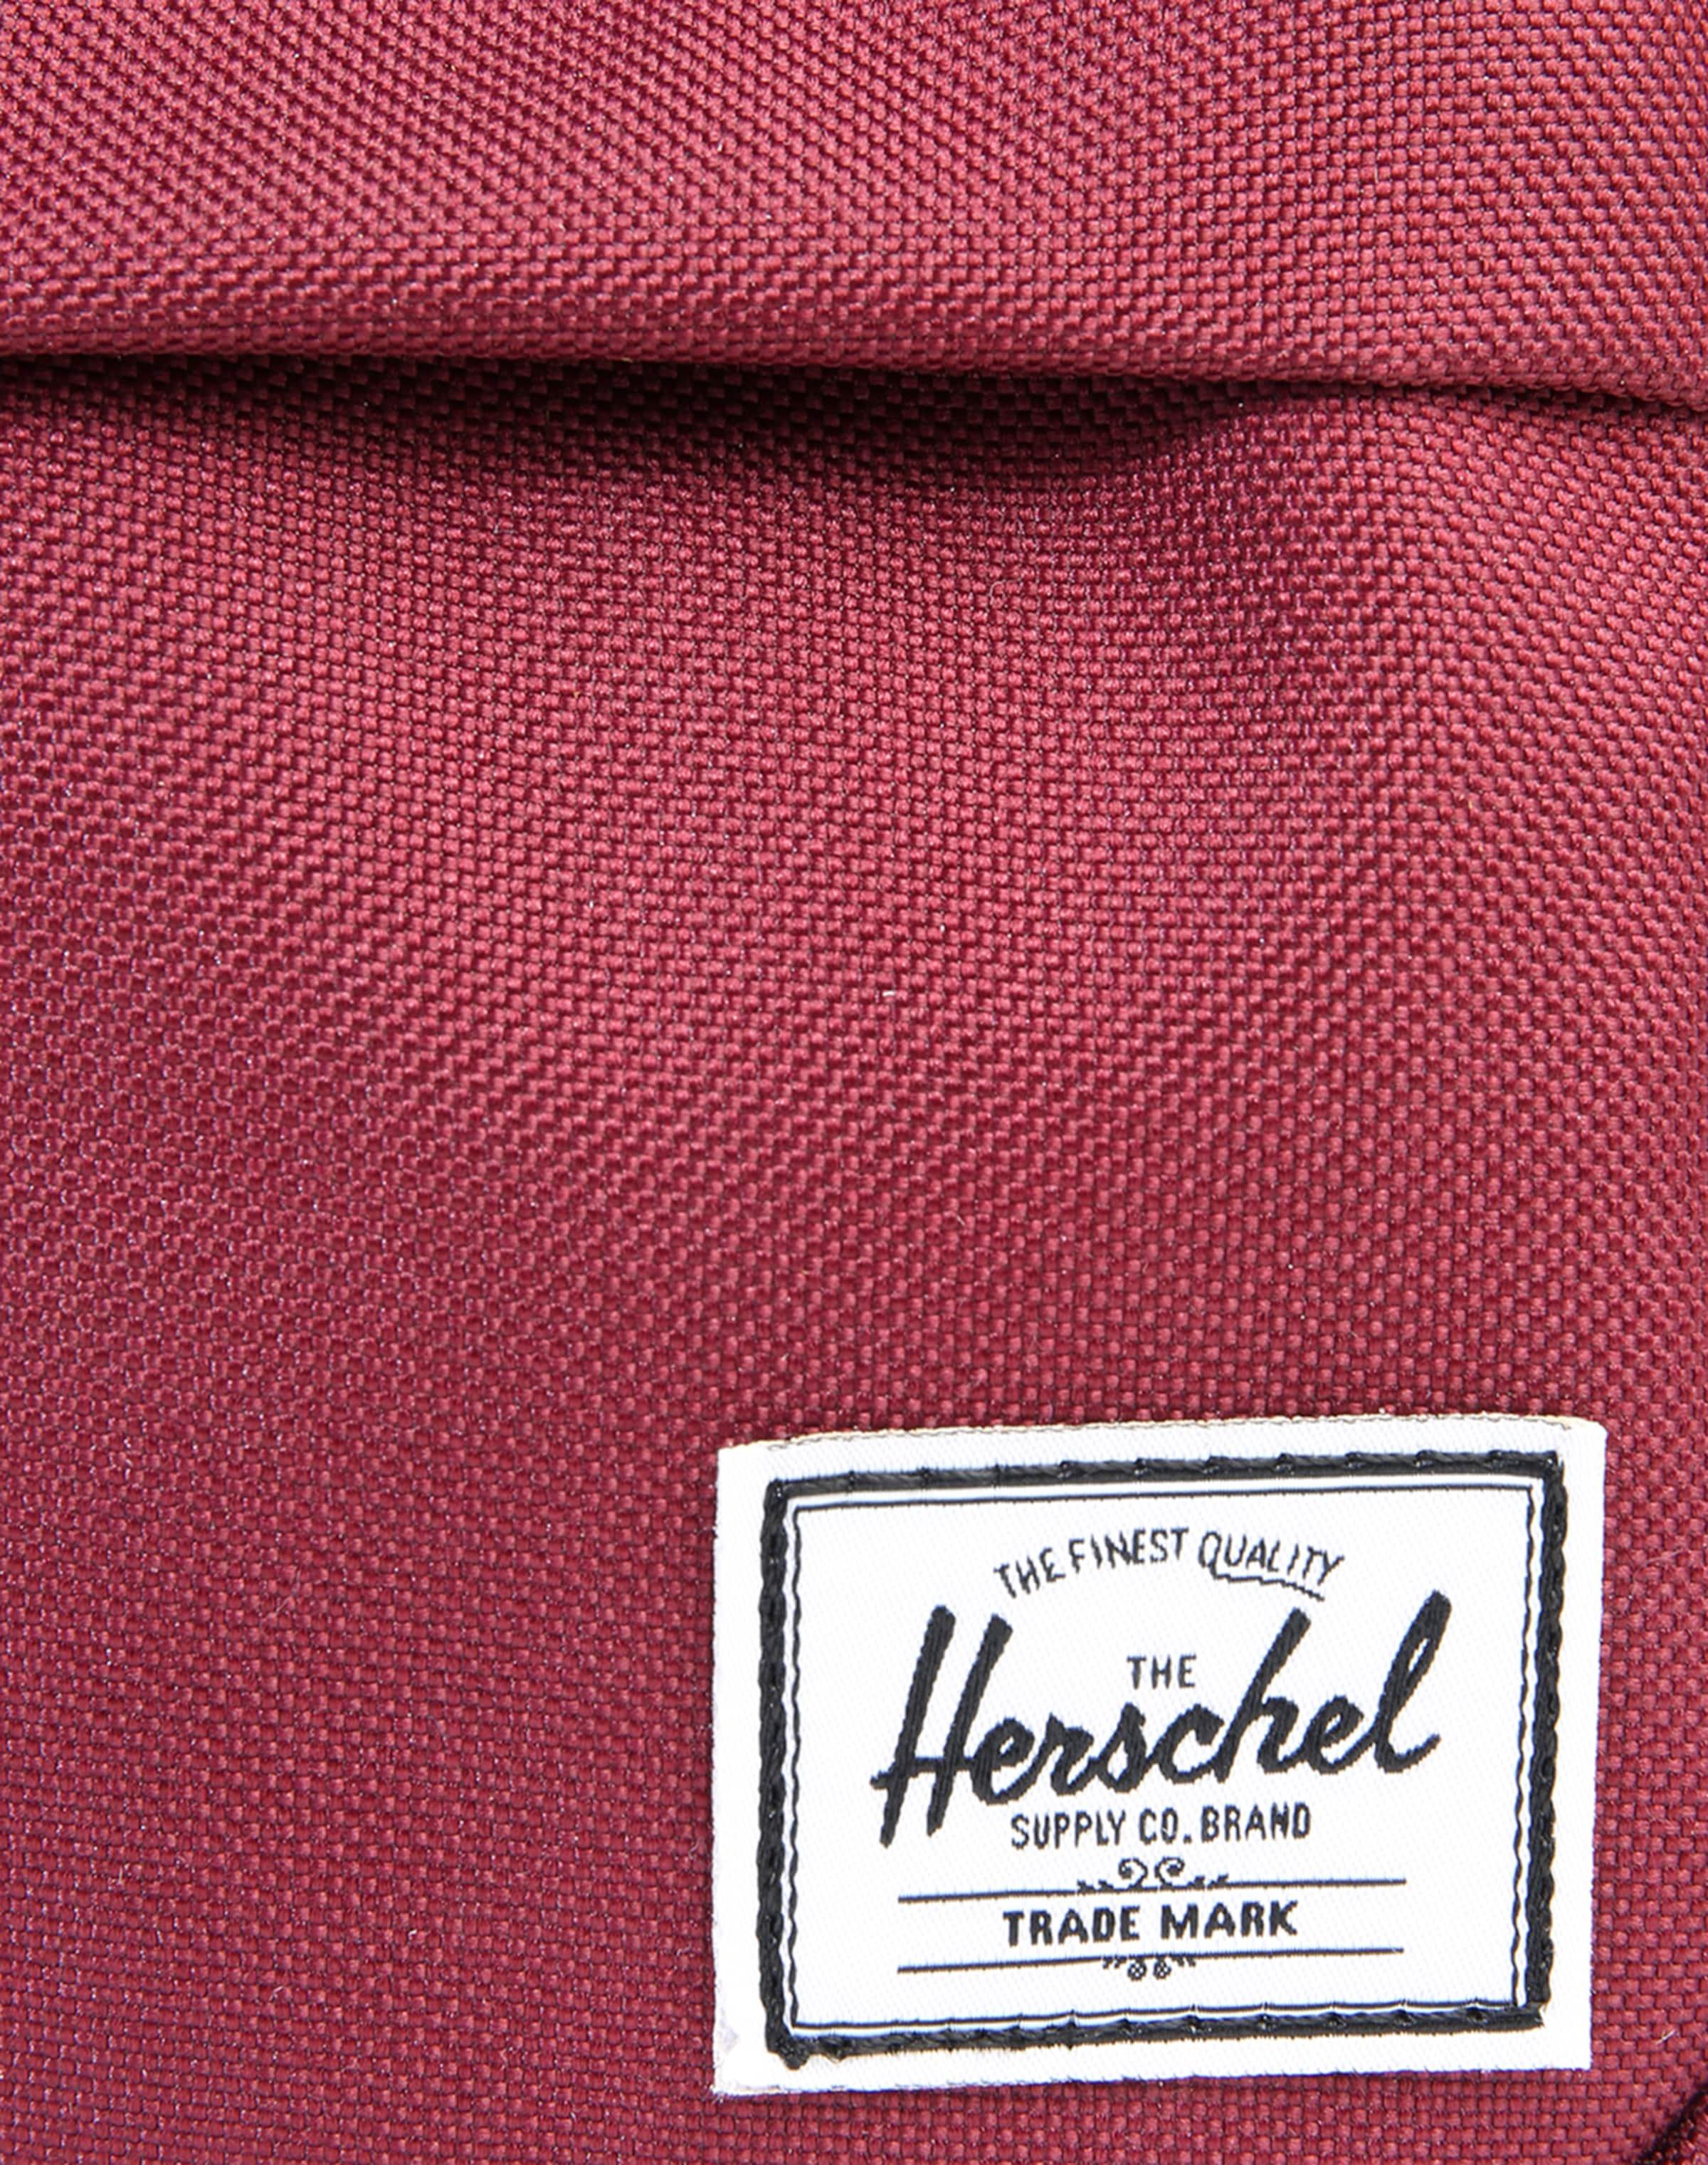 'Chapter Herschel On' Herschel Kulturtasche Kulturtasche Carry wR56tWxCq